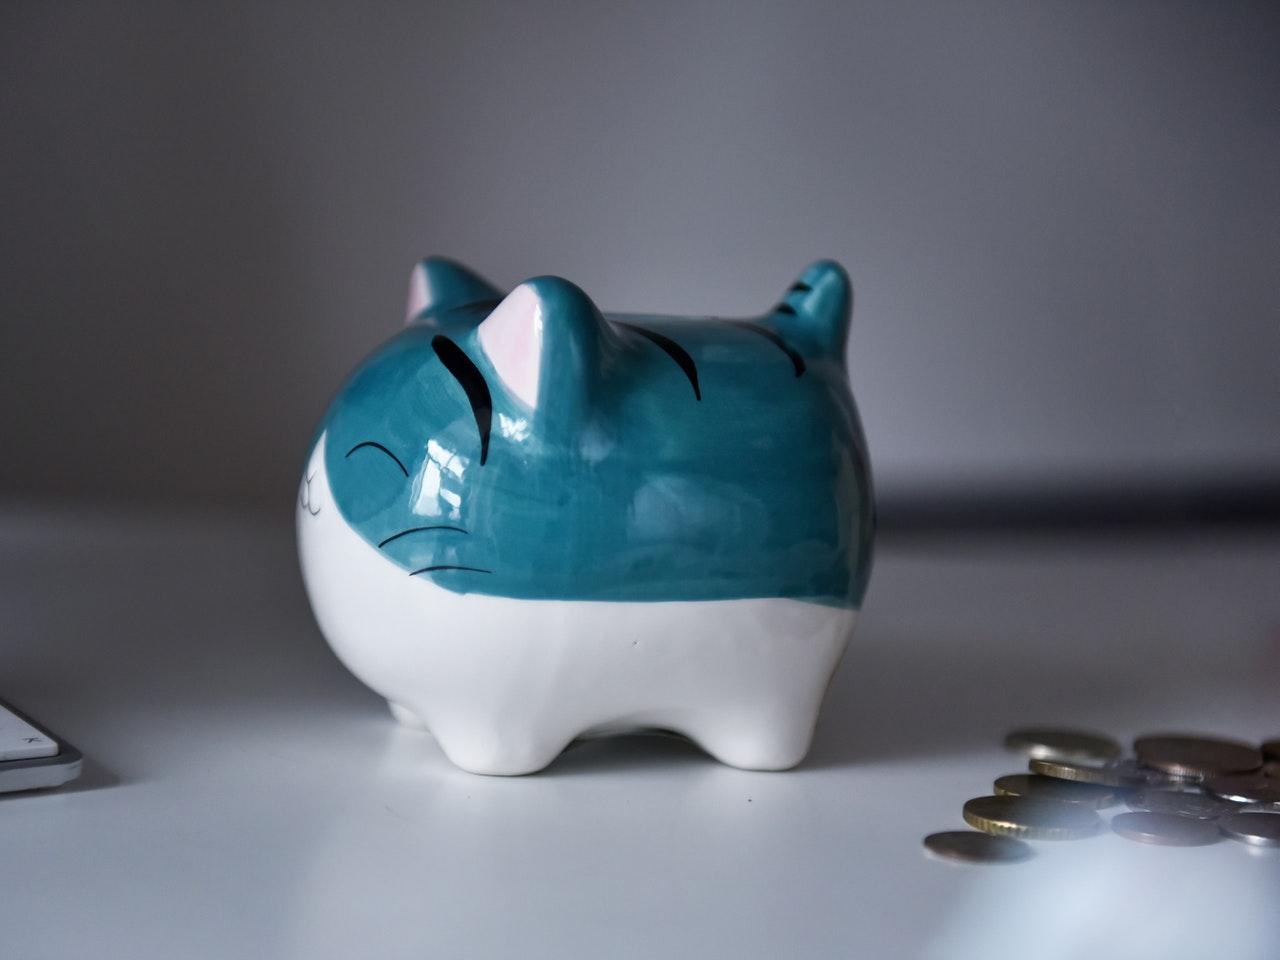 A Cute Cat Piggy Bank from Anna Tis on Pexels